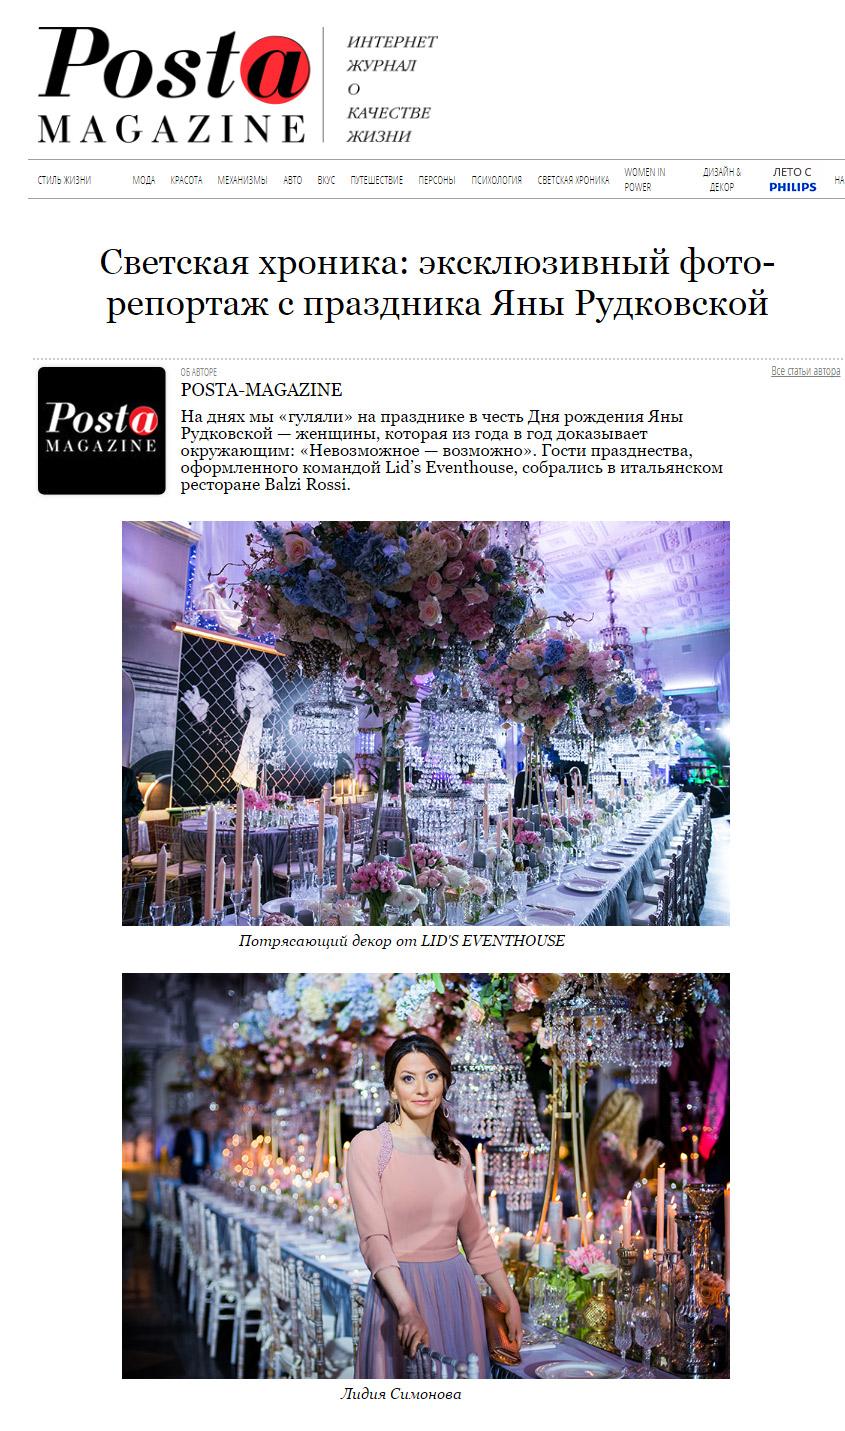 Posta Magazine